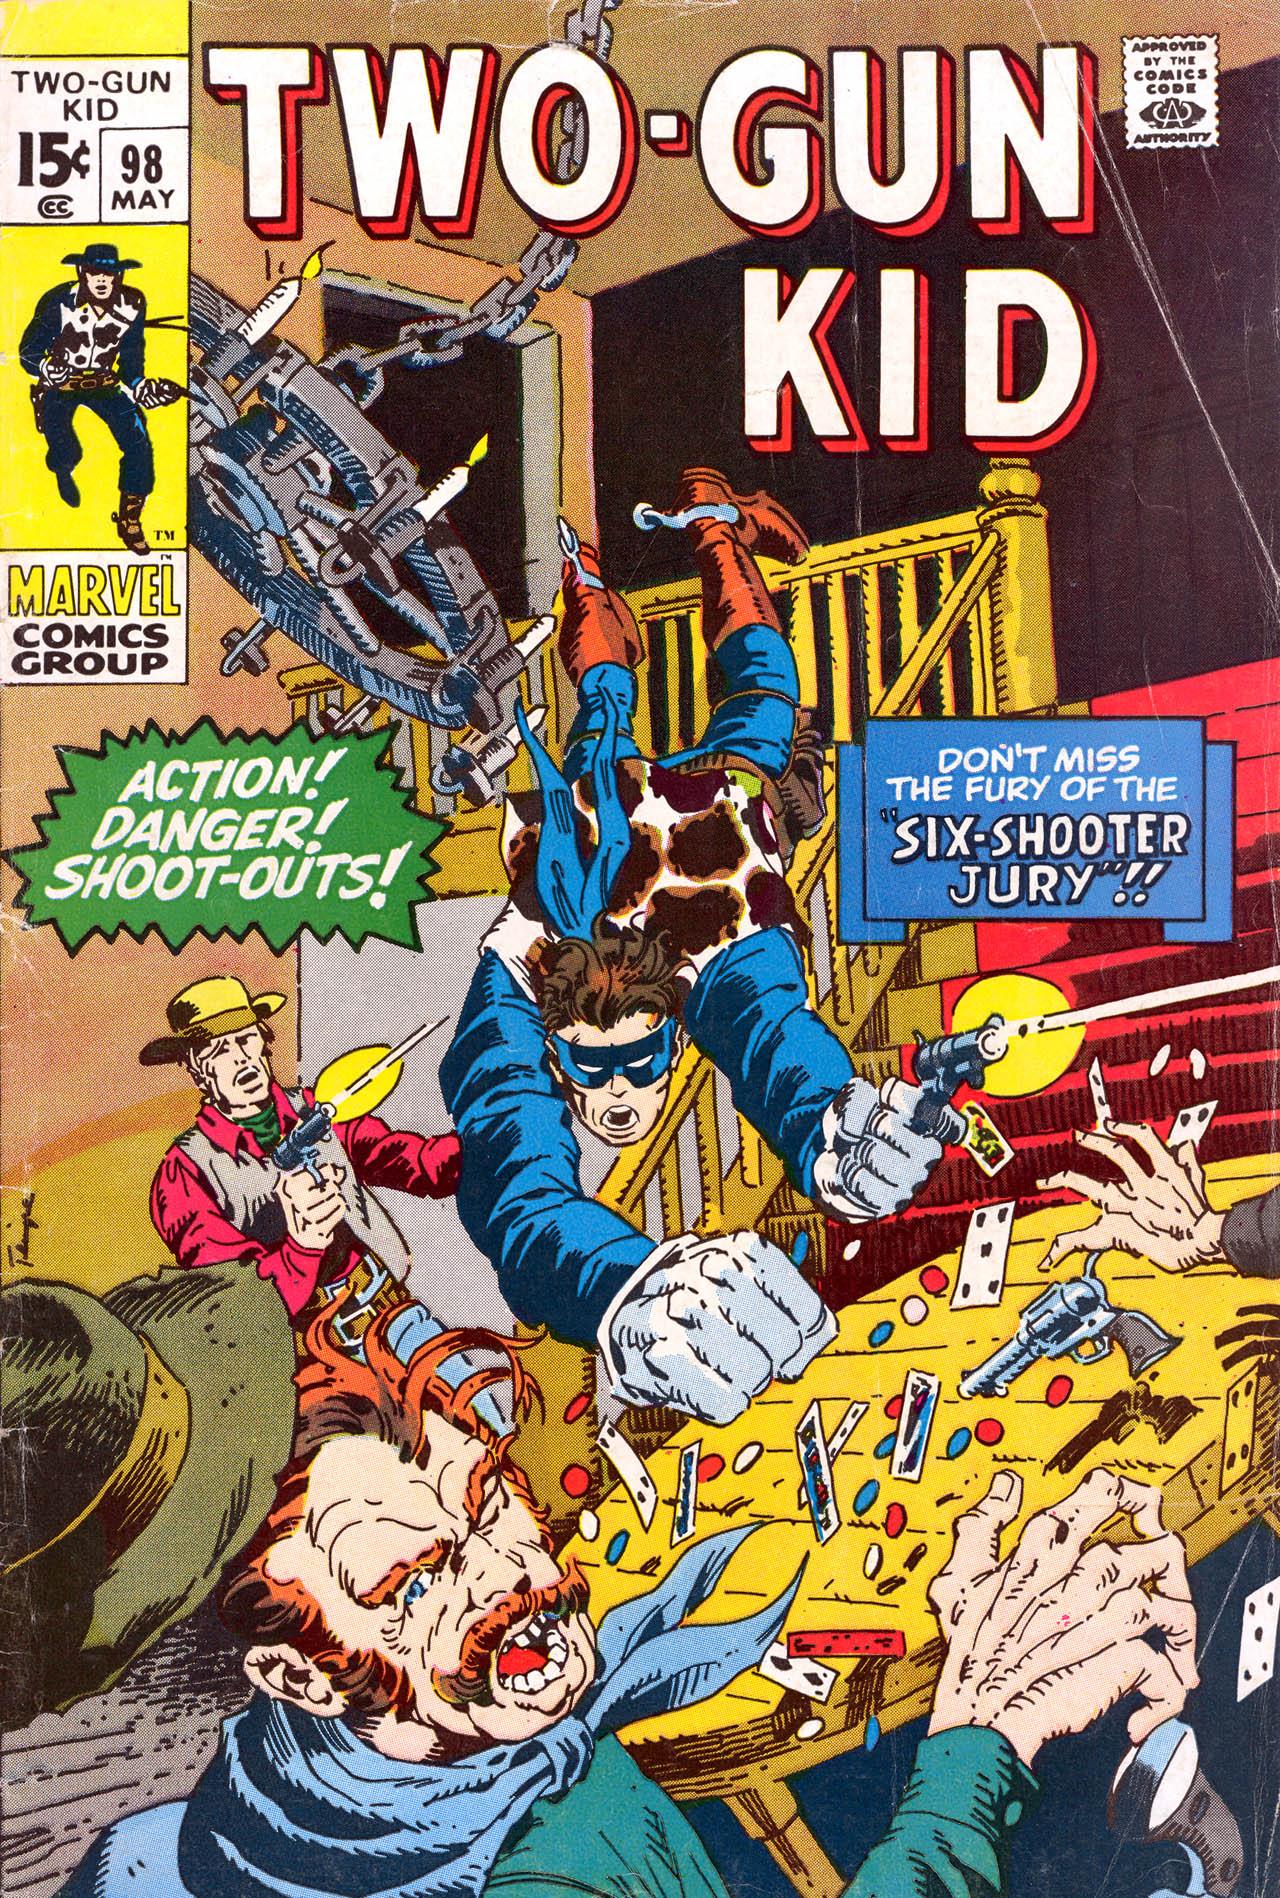 Read online Two-Gun Kid comic -  Issue #98 - 1